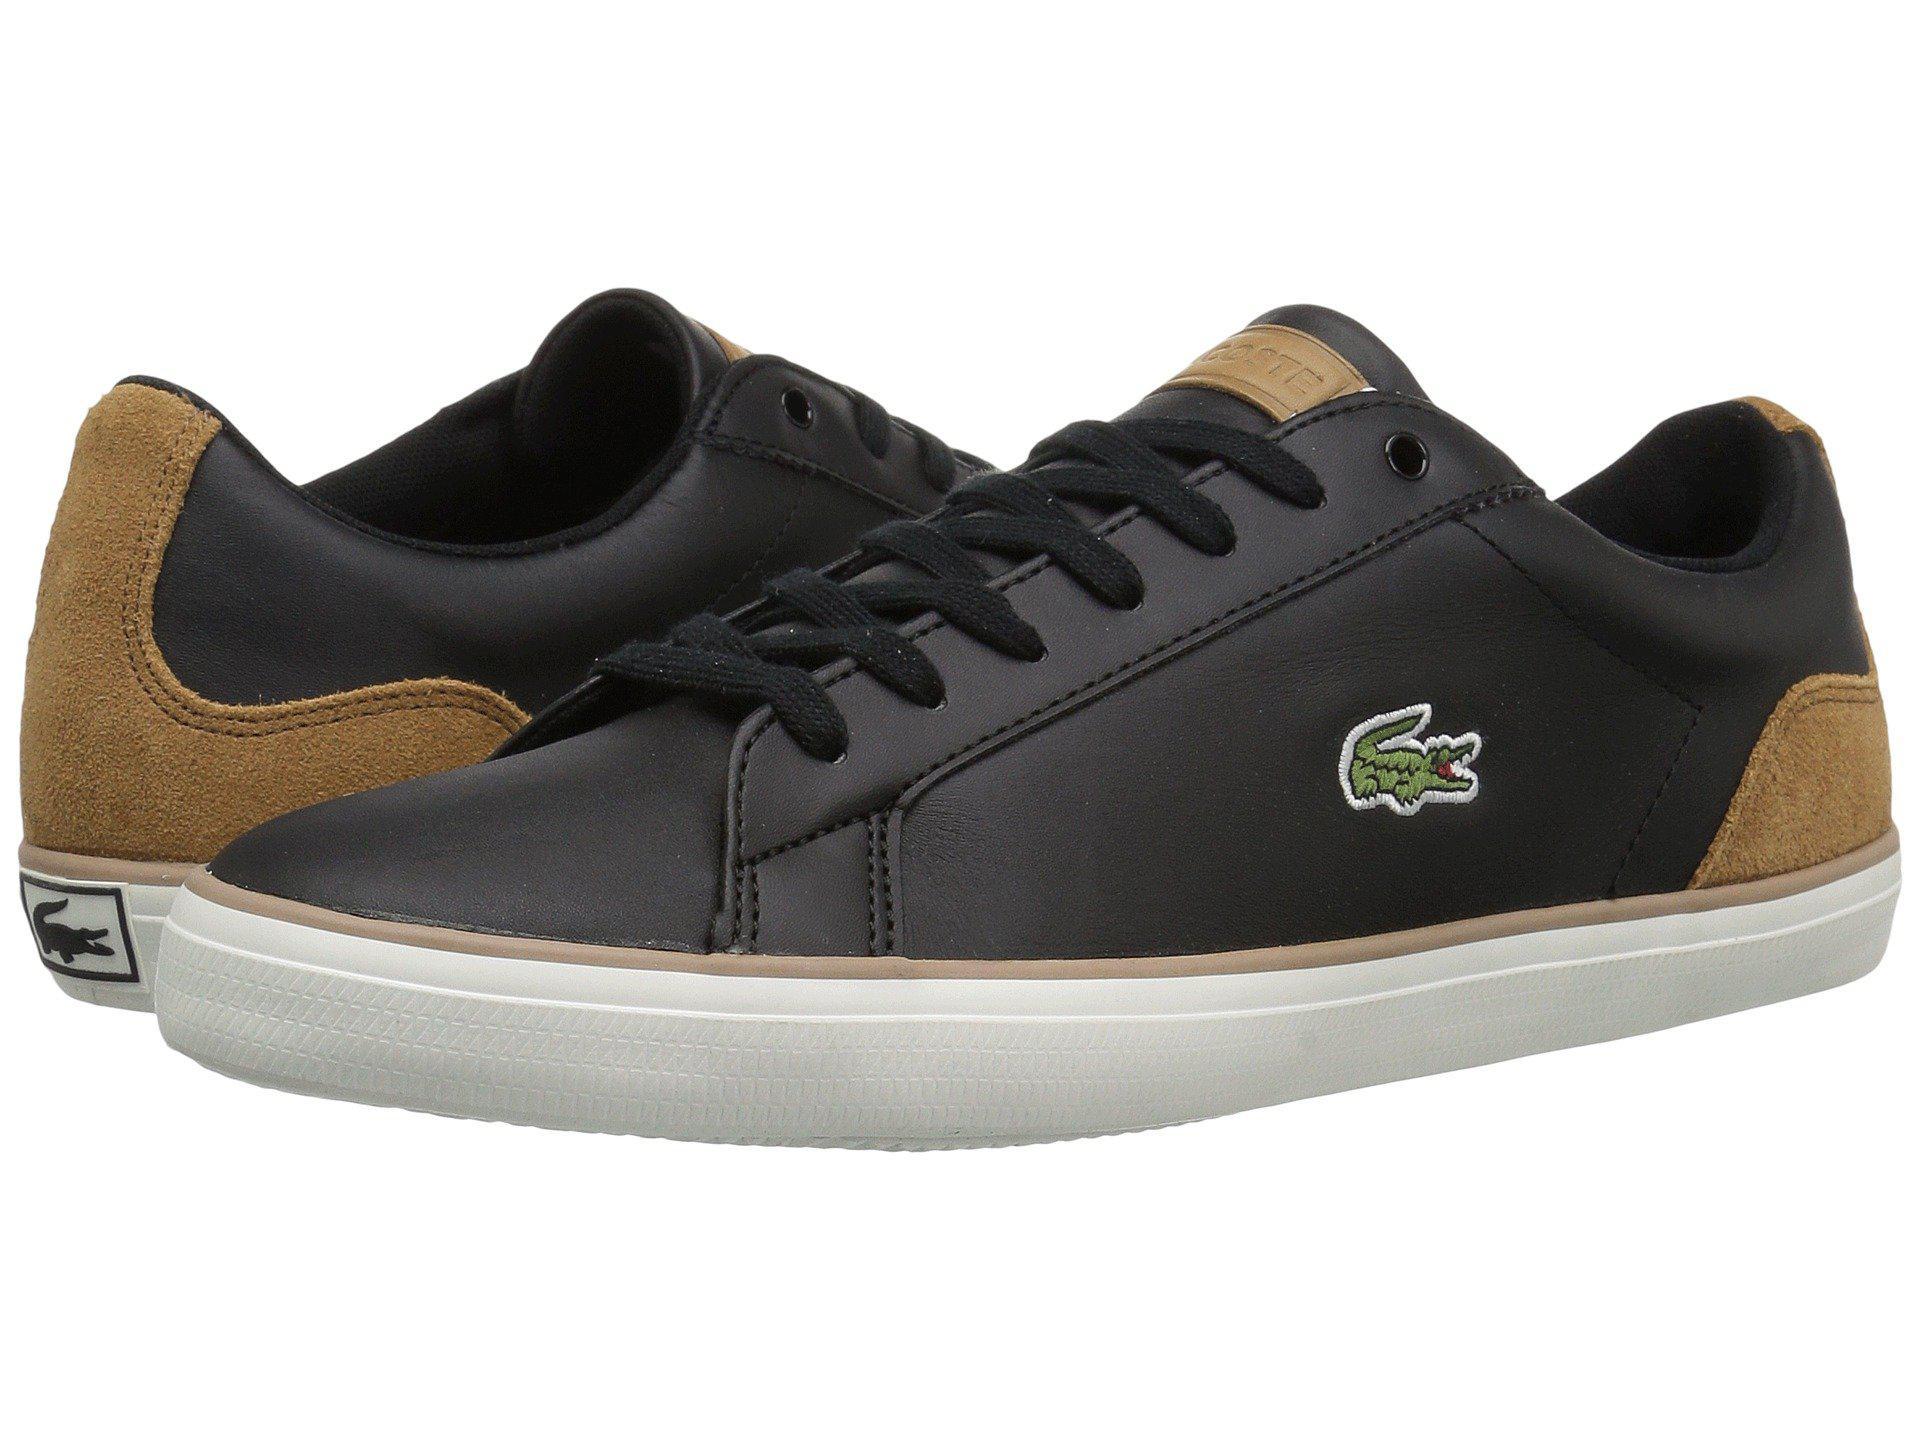 9483be568fbc4 Lyst - Lacoste Lerond 118 1 (black light Brown) Men s Shoes in Black ...